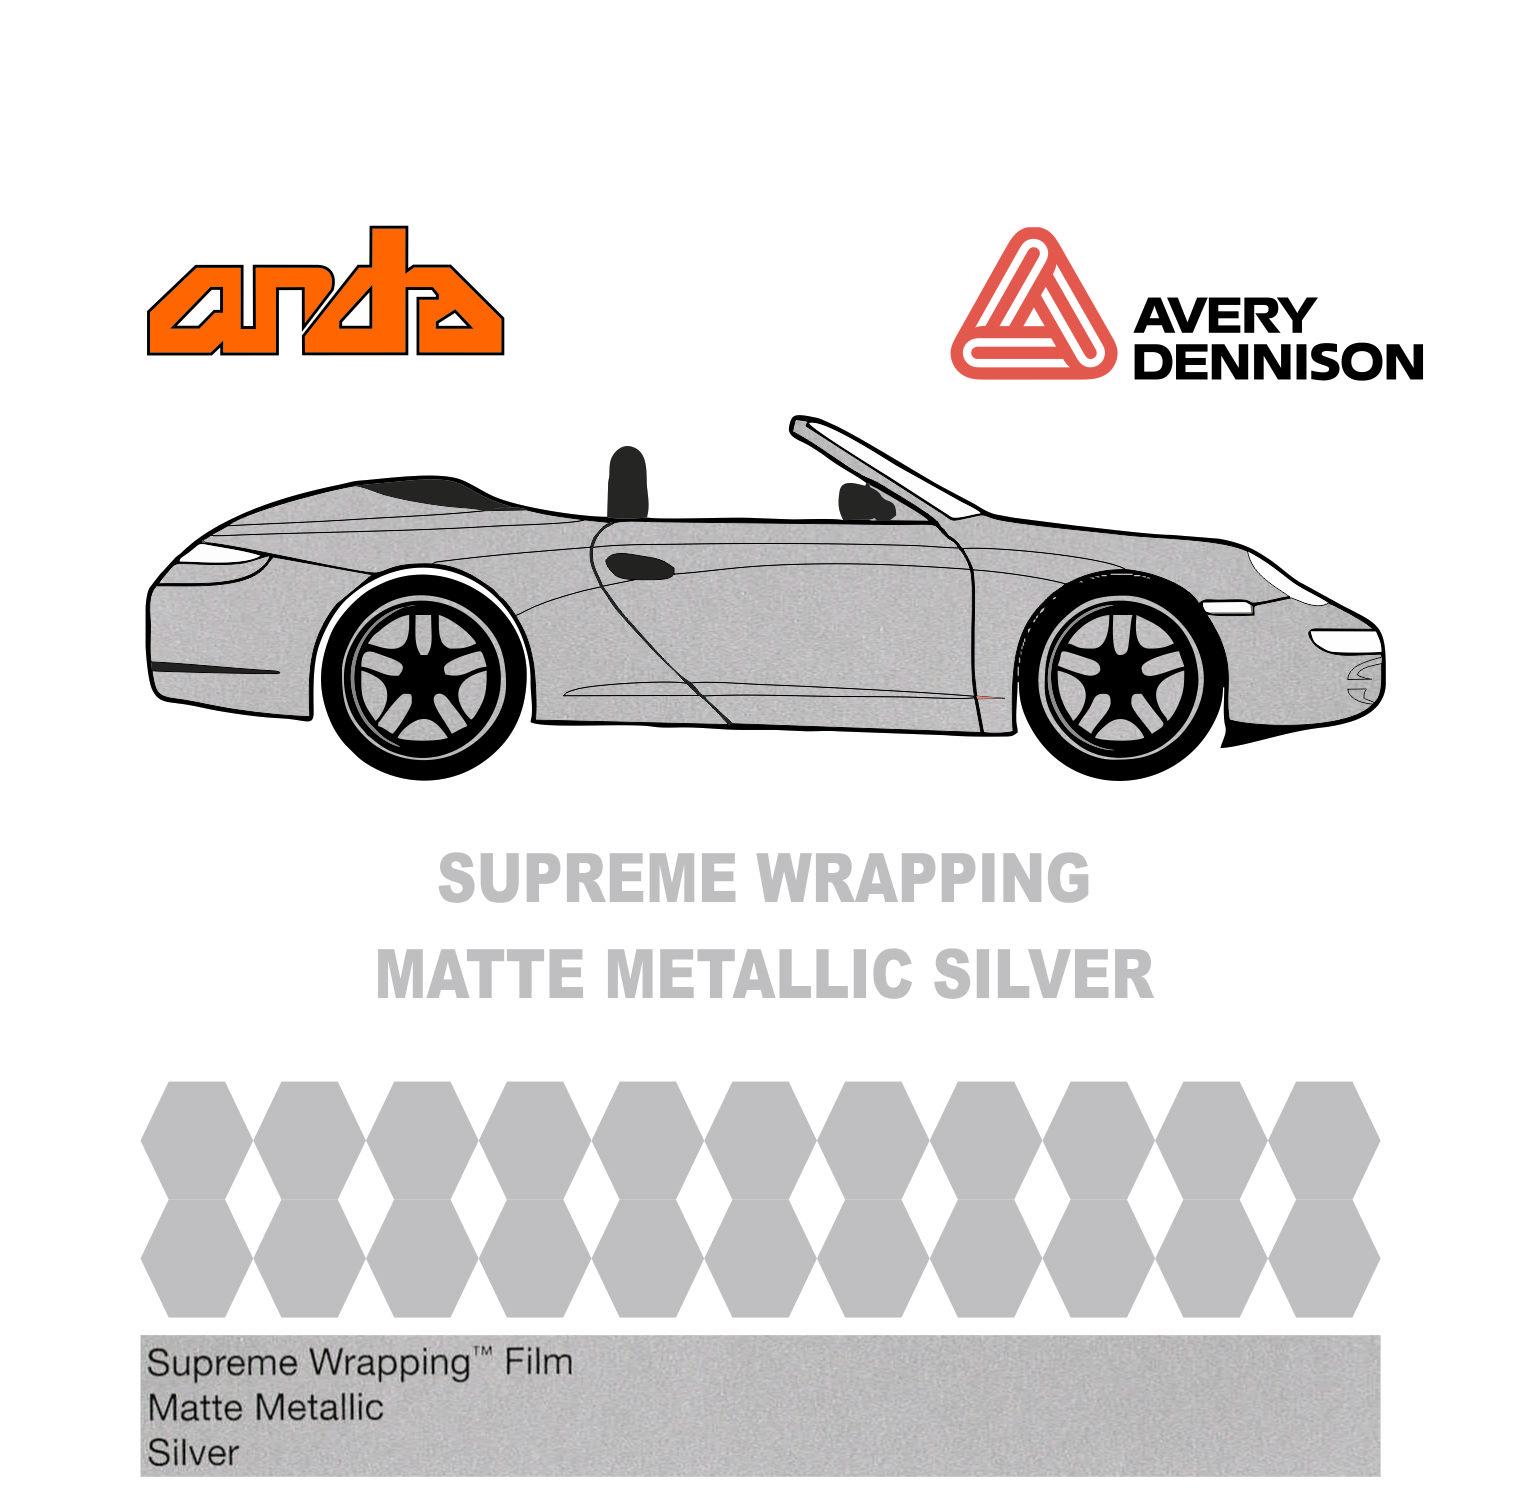 Avery Dennison- SWF Matte Metallic Silver 1